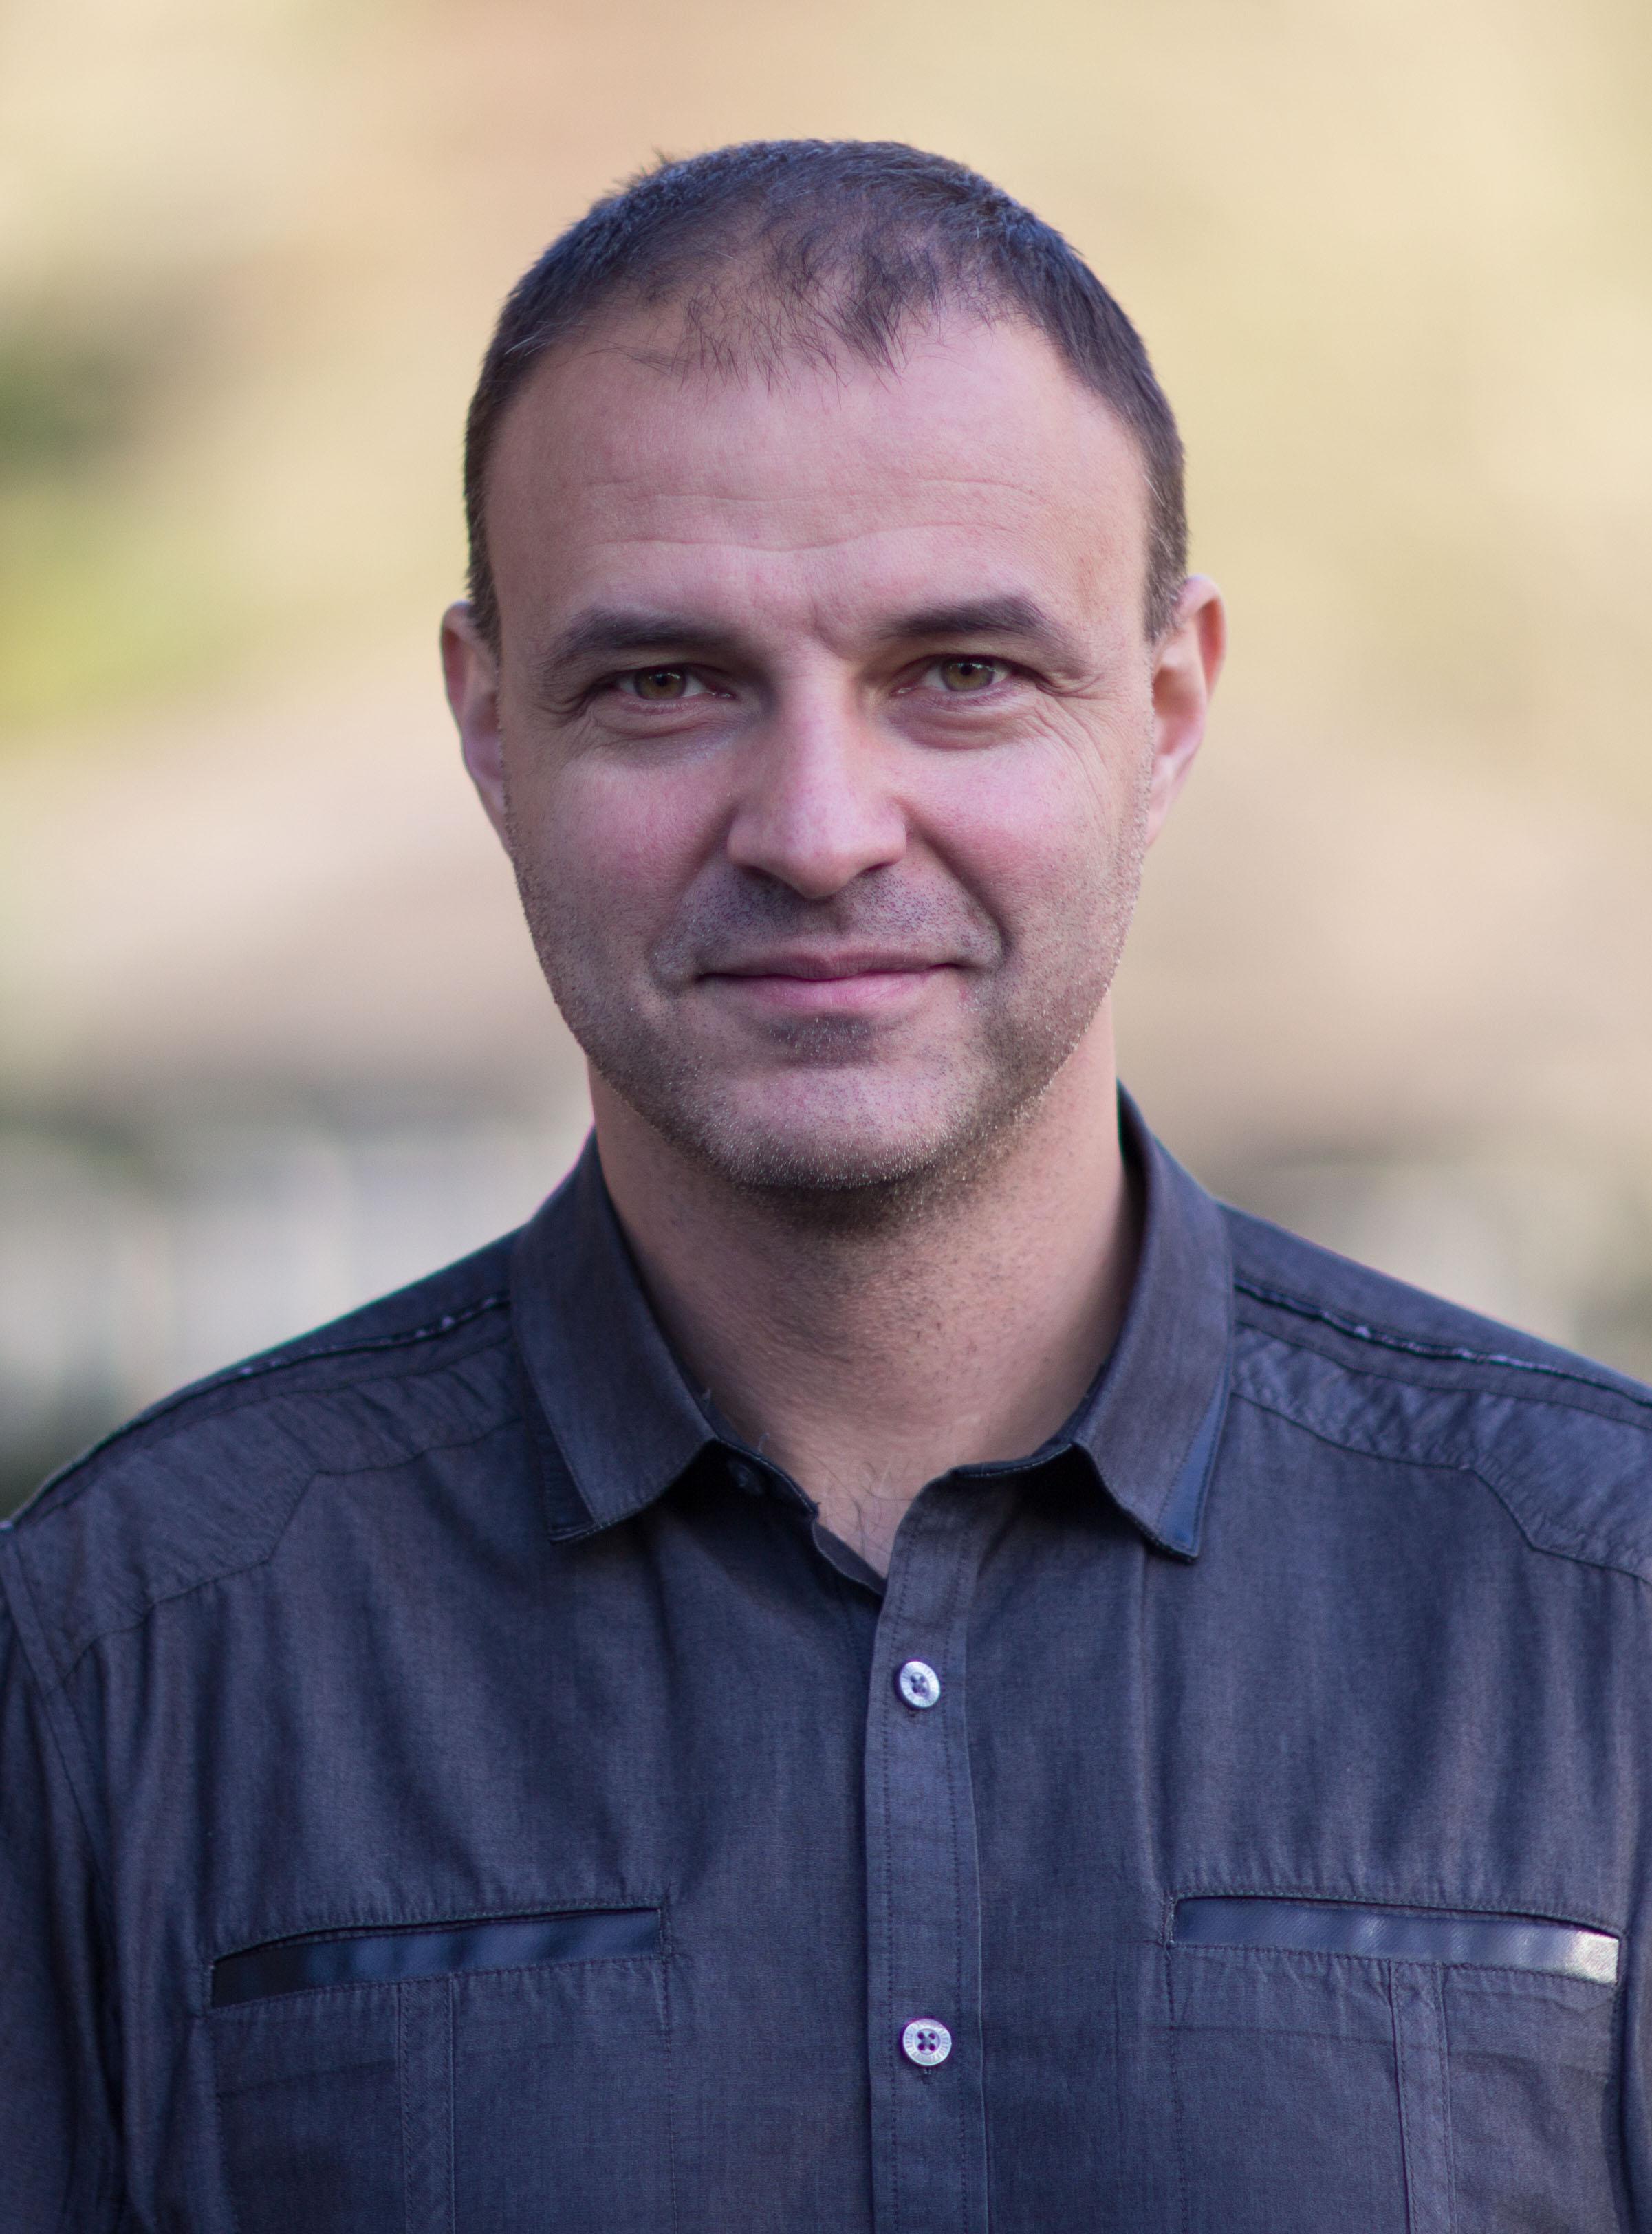 Max Simonovsky